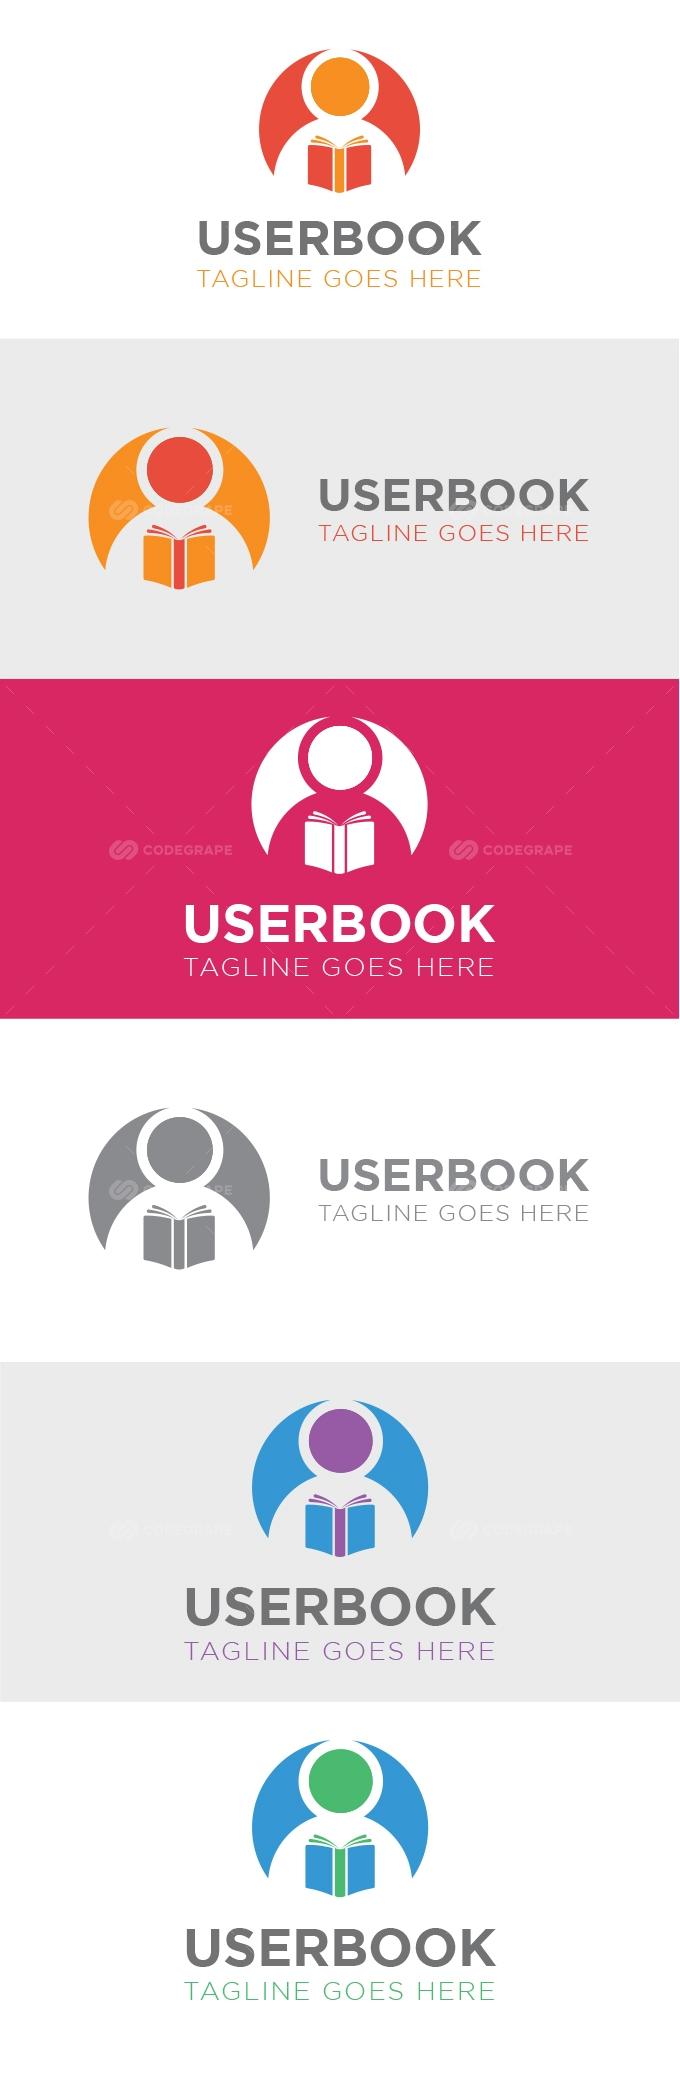 Userbook Logo